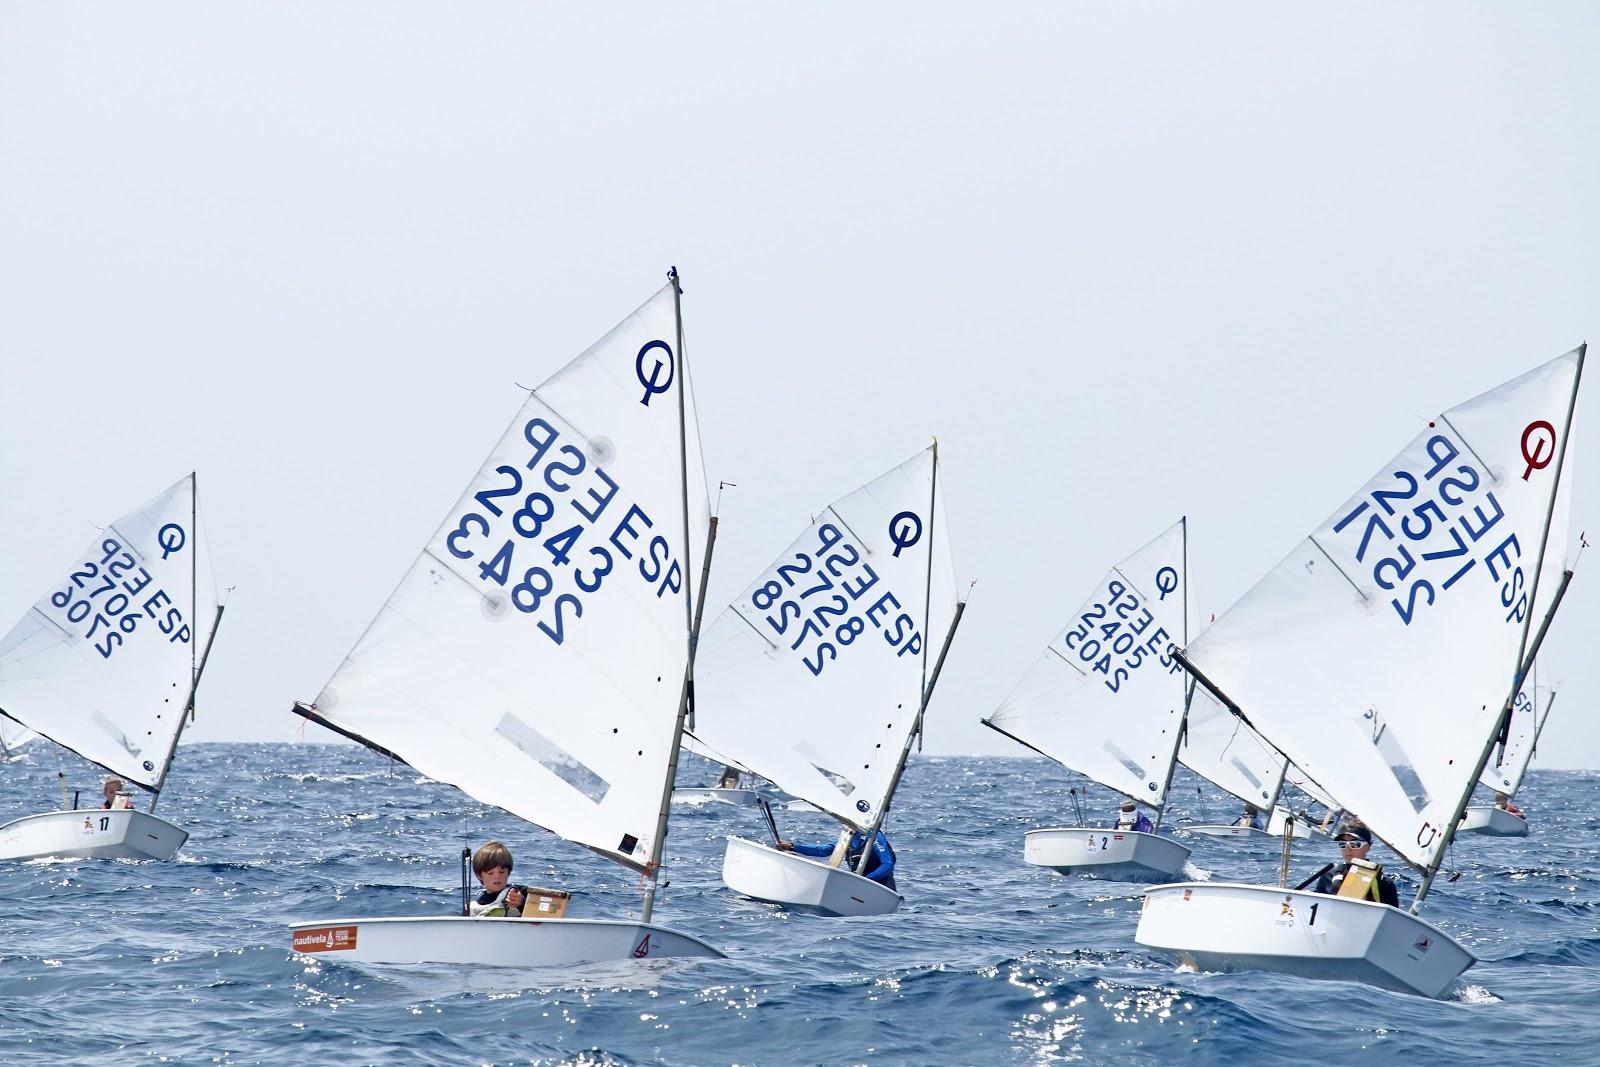 1ª Jornada - Campeonato Optimist A y Femenino